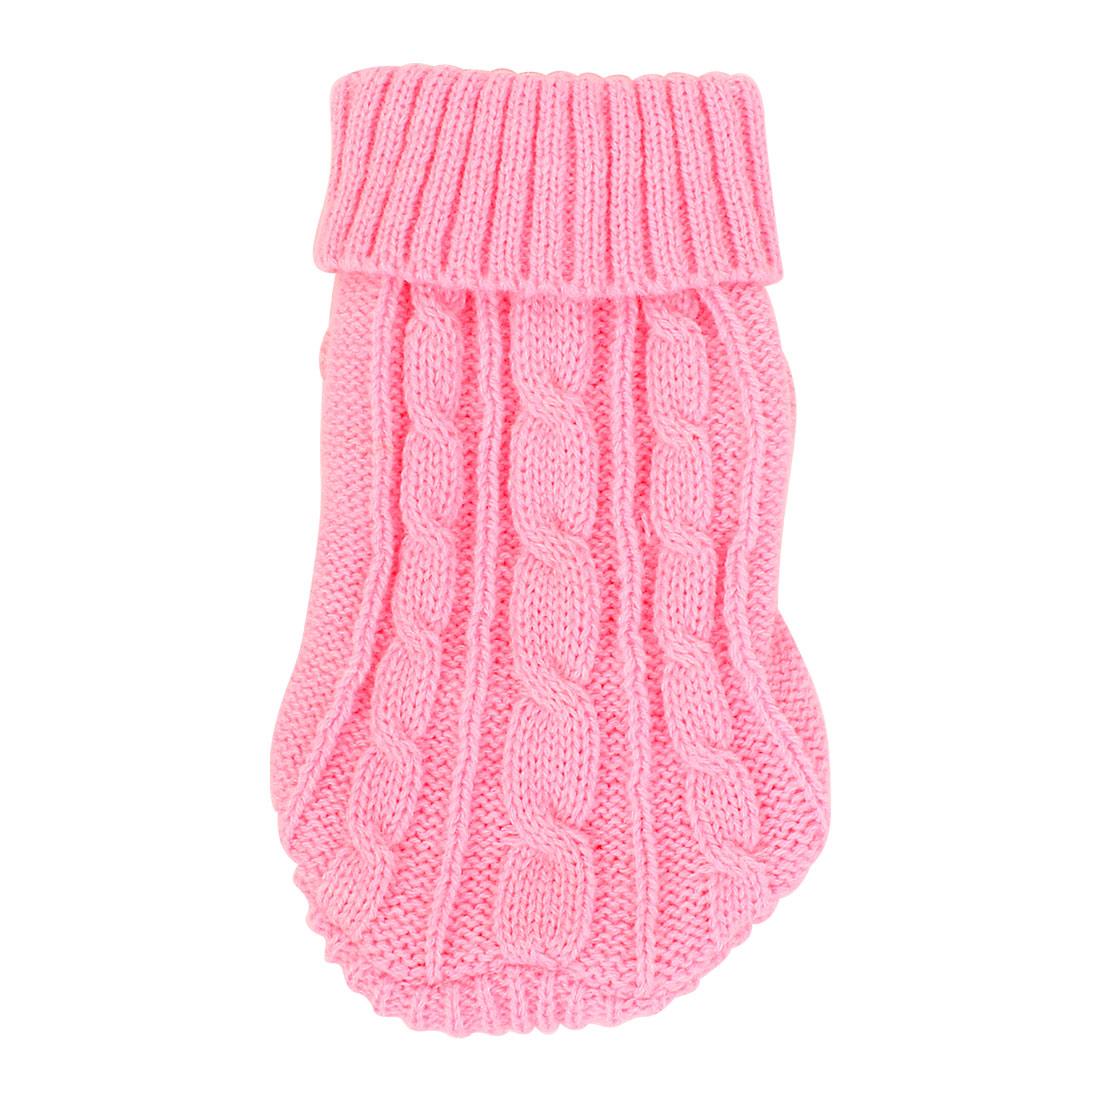 Unique Bargains XXS Sweater Knit Ribbed Cuff Turtleneck Apparel Cozy Clothes Pet Dog Cat Puppy